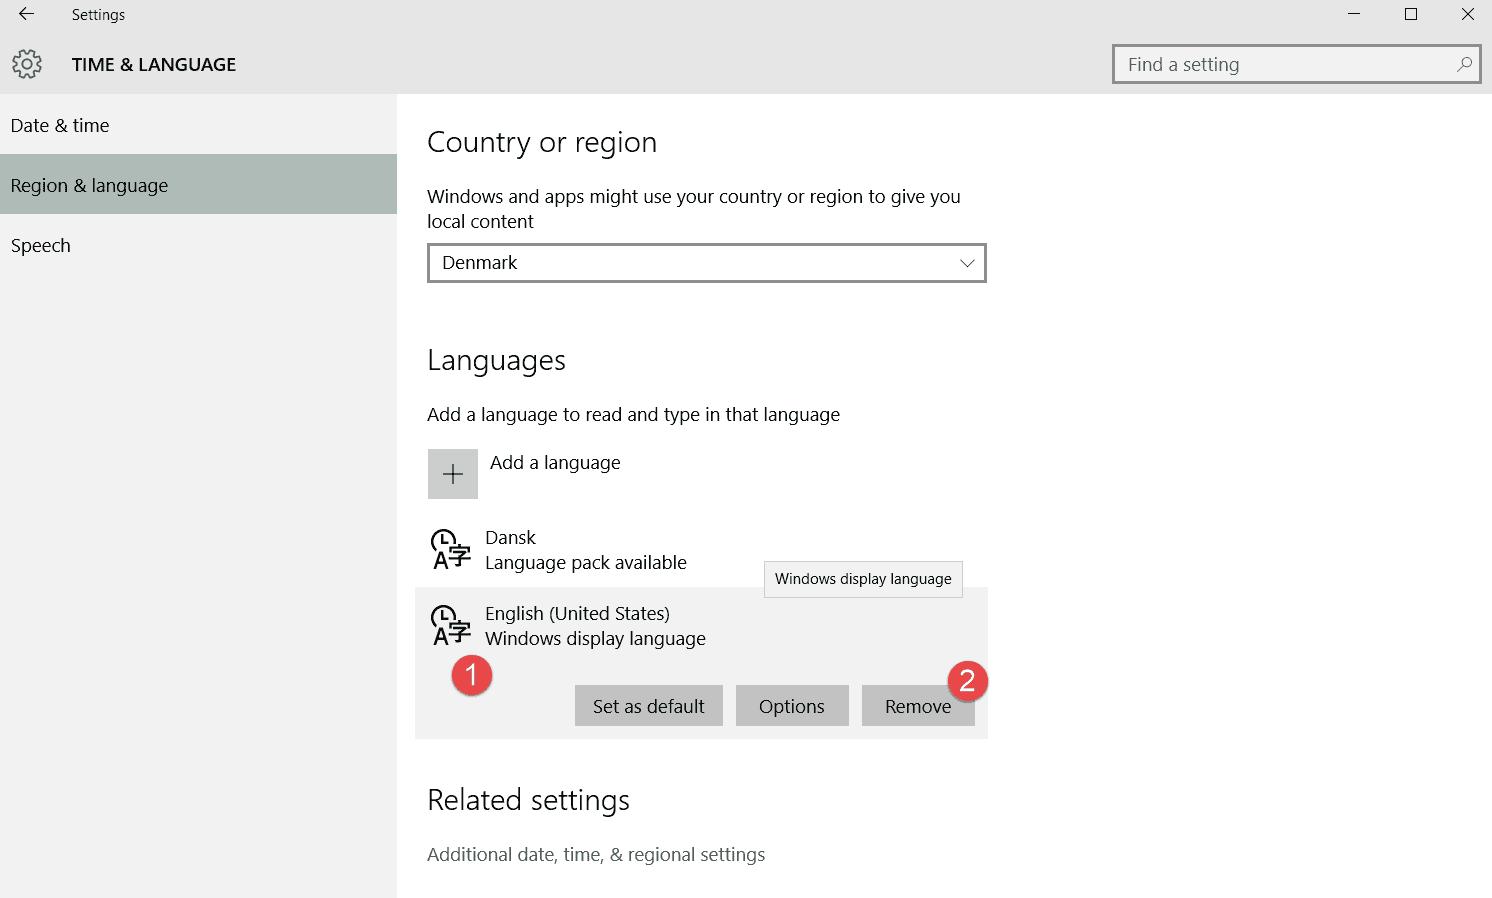 kan man afinstallere windows 10